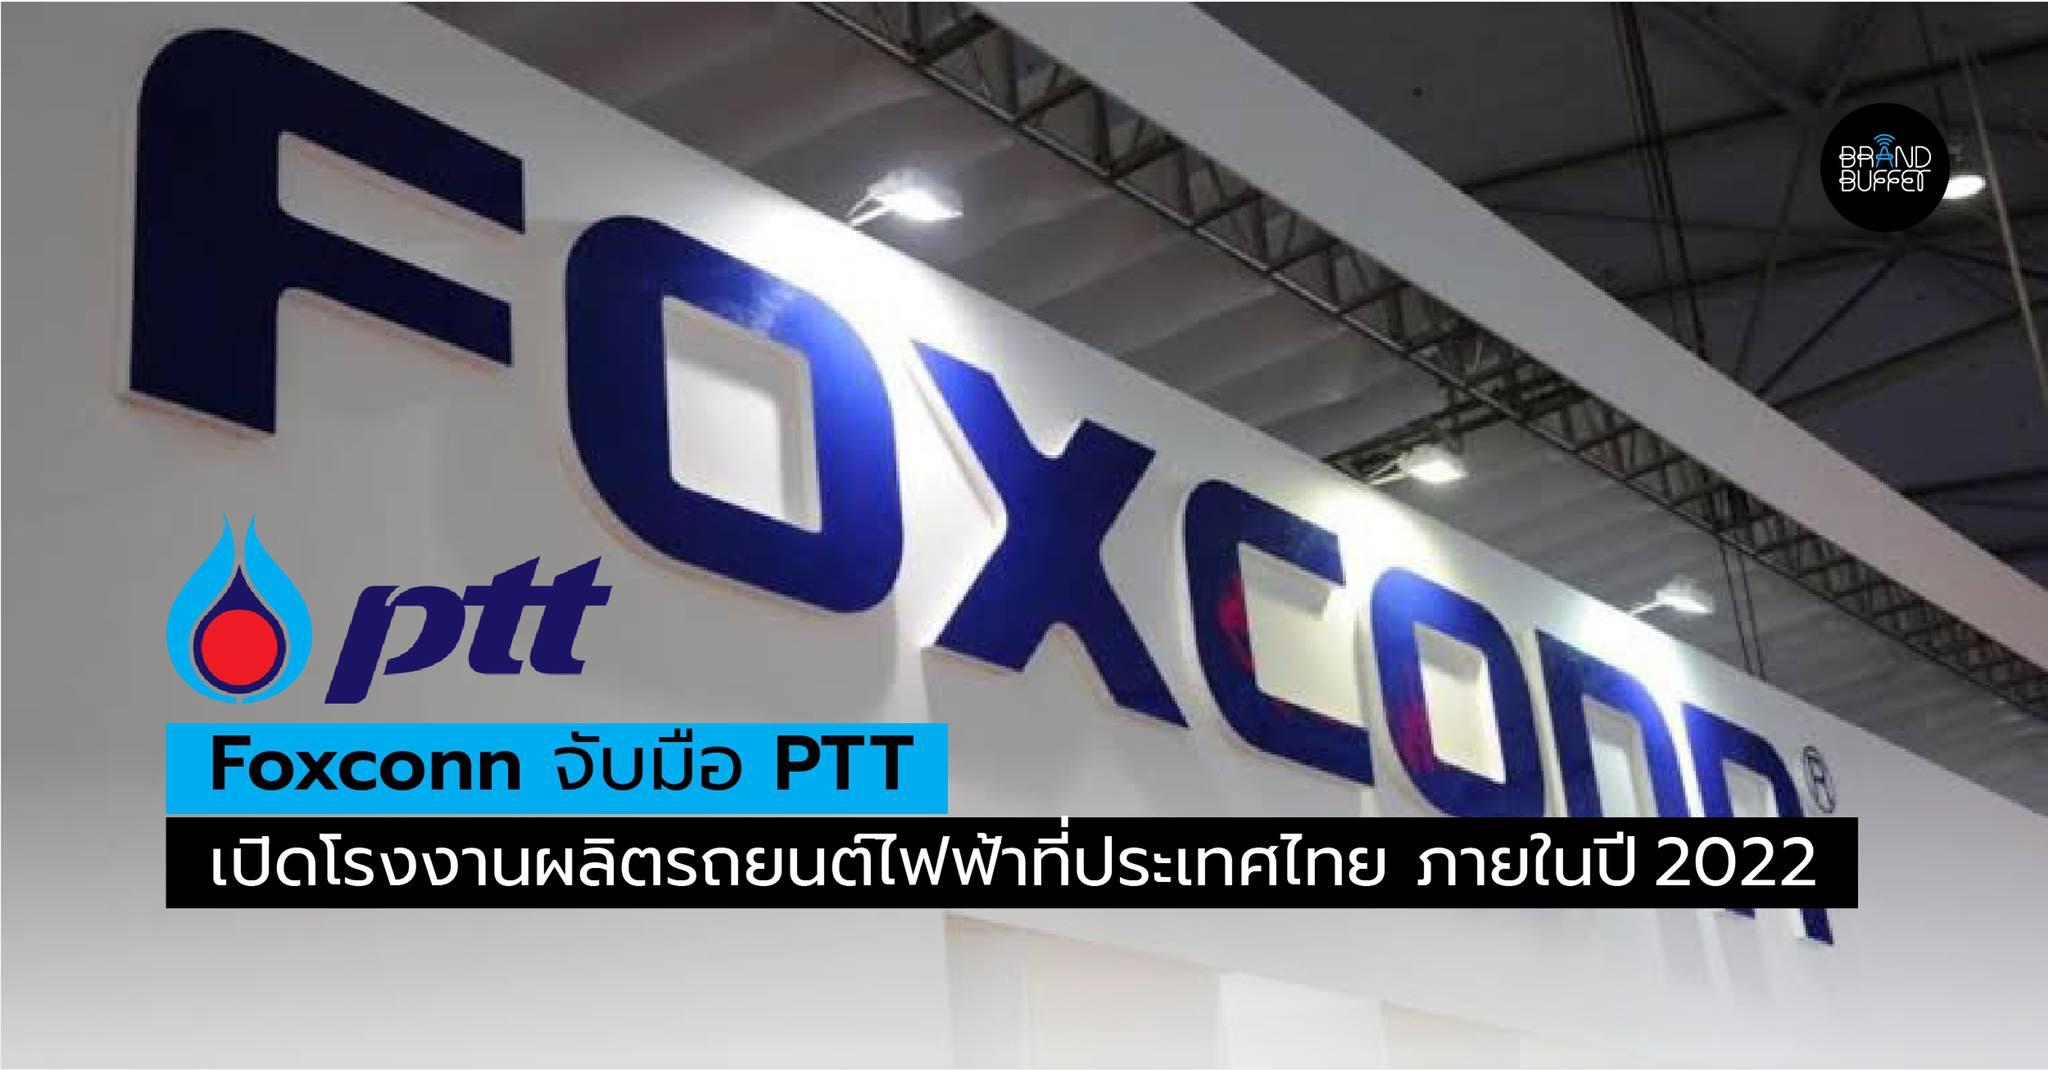 foxconn ptt plant ev